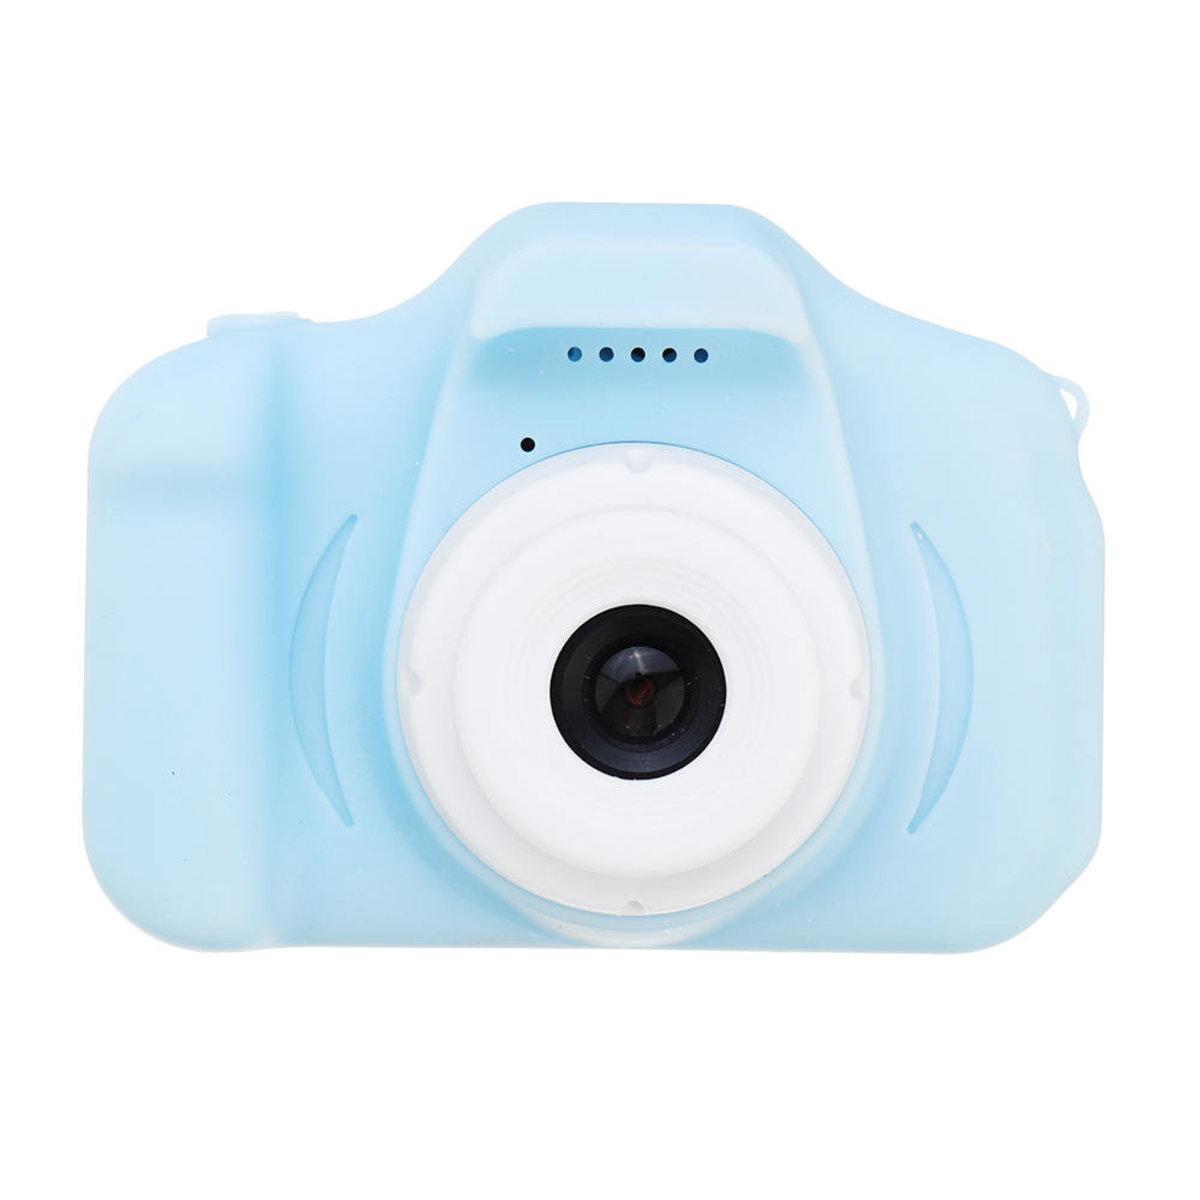 X2 兒童數碼相機 (Blue) - 兒童,教材,玩具,禮物